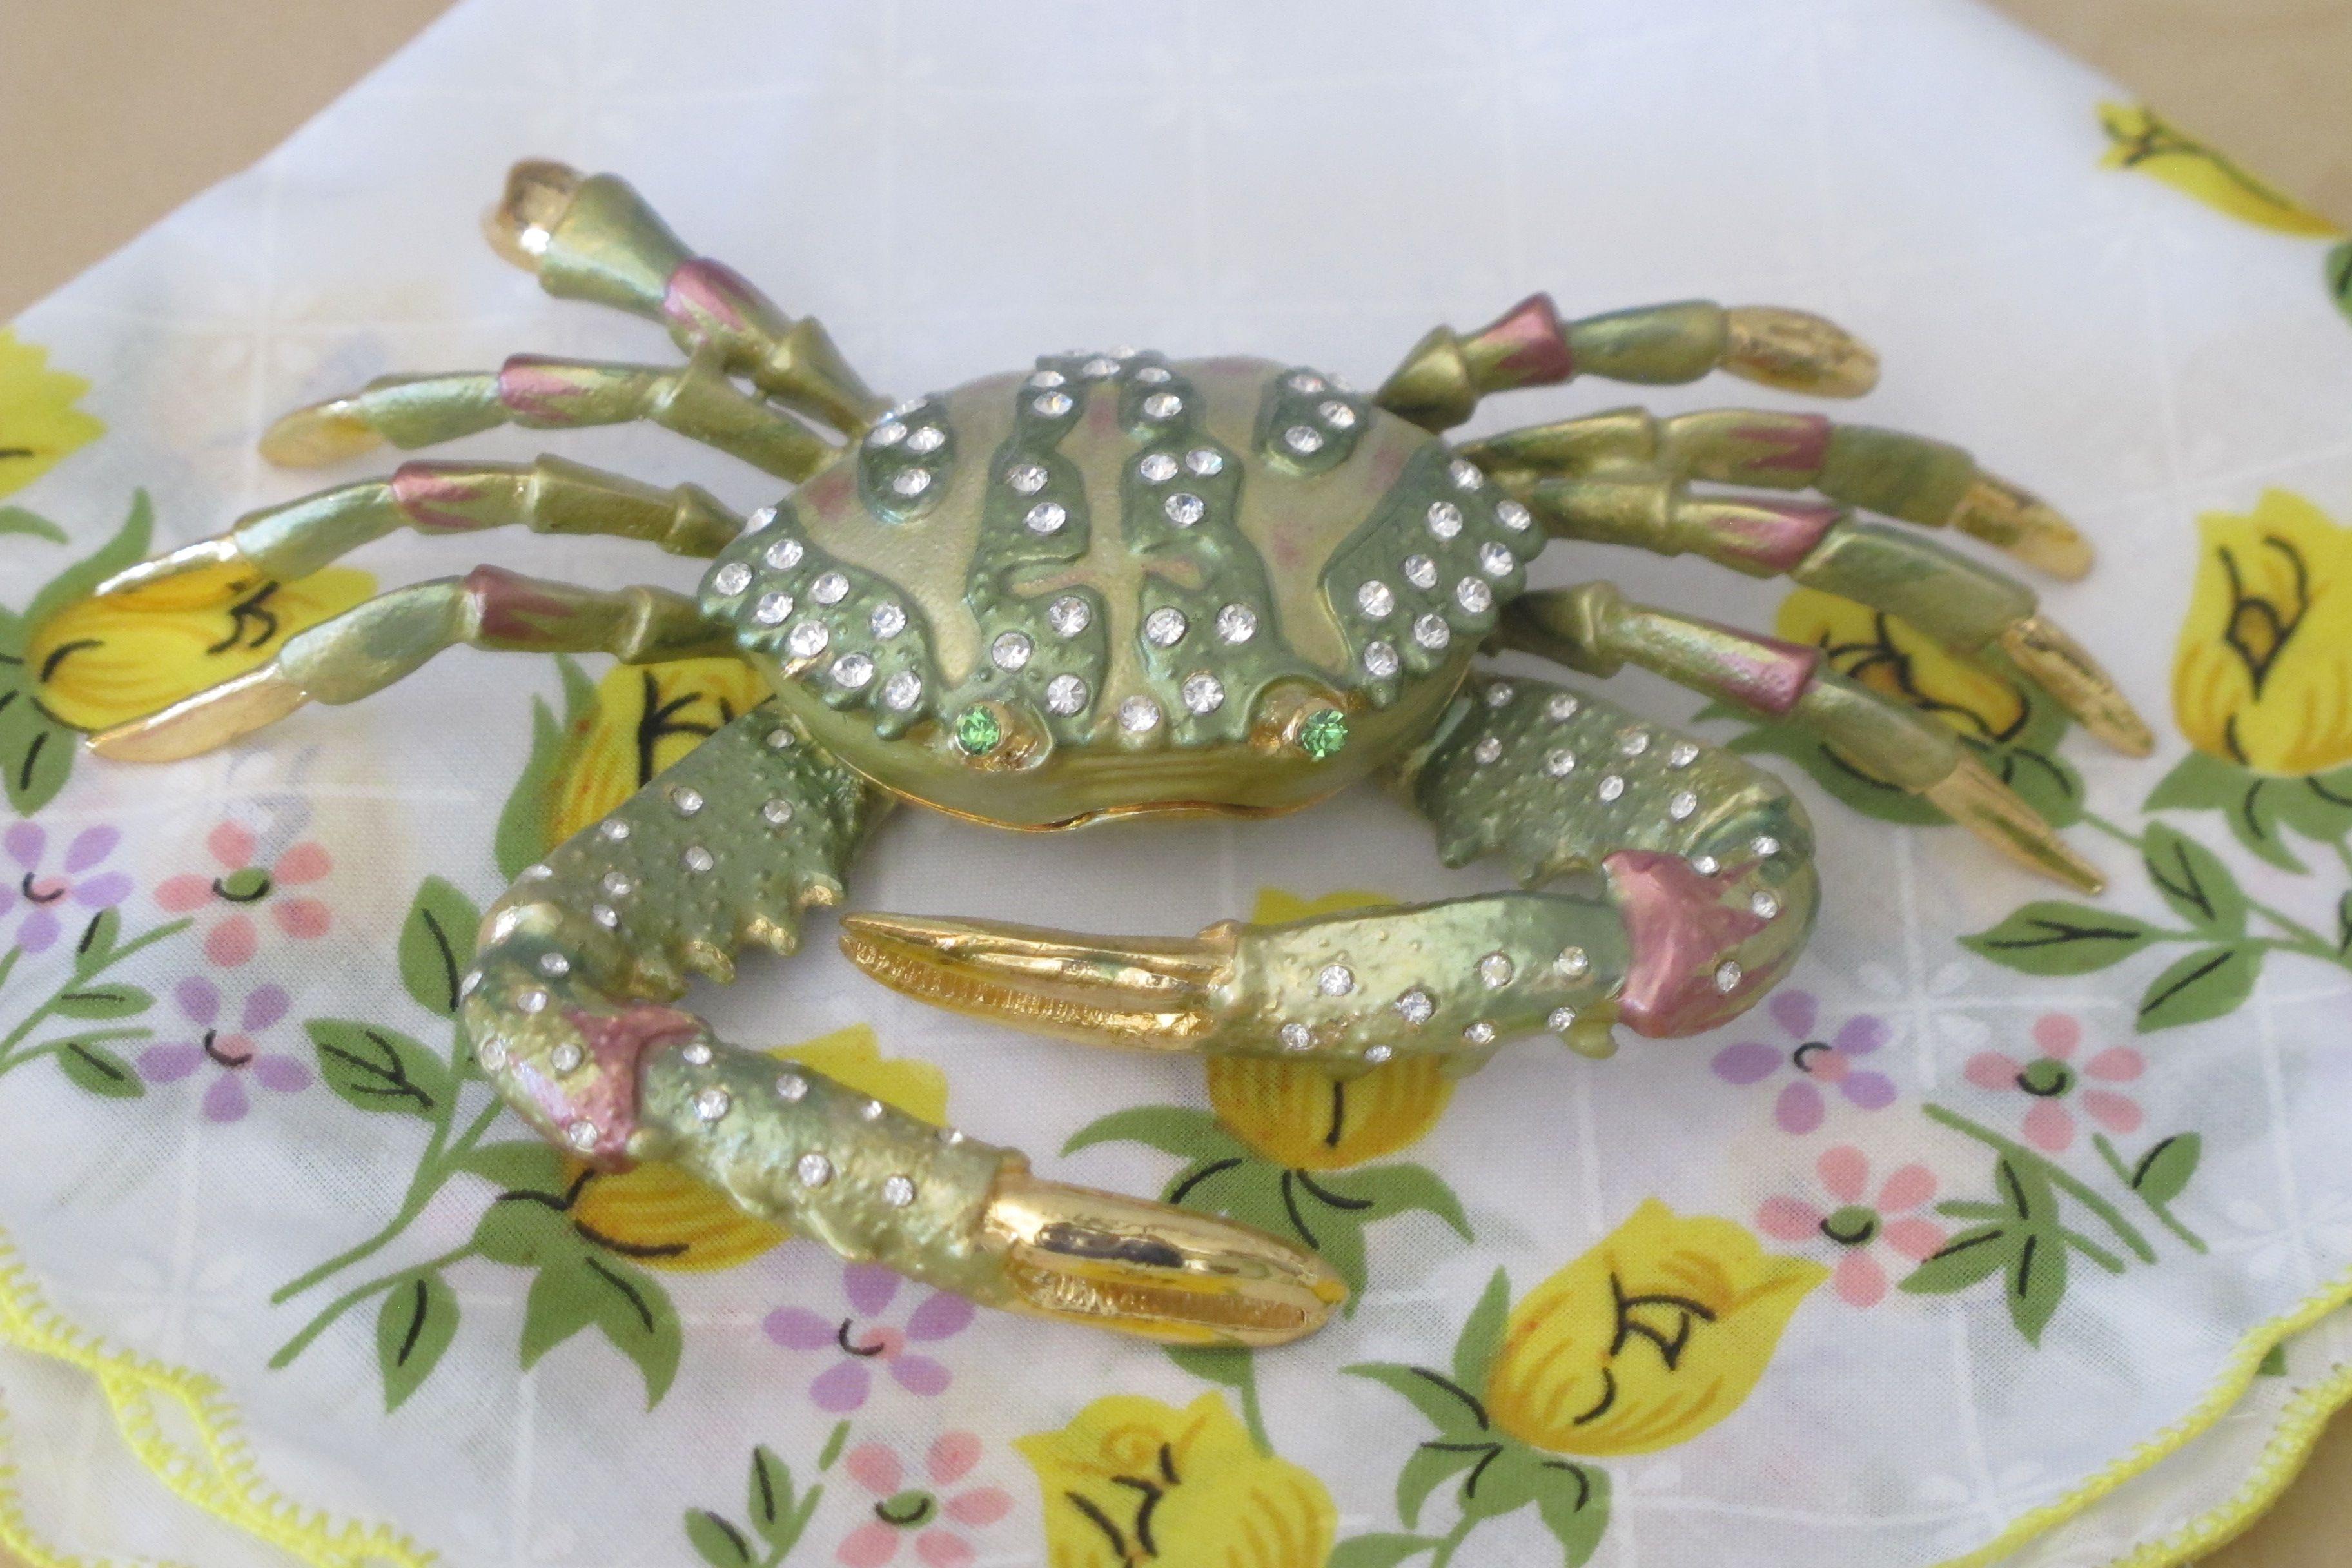 Green crab trinket box